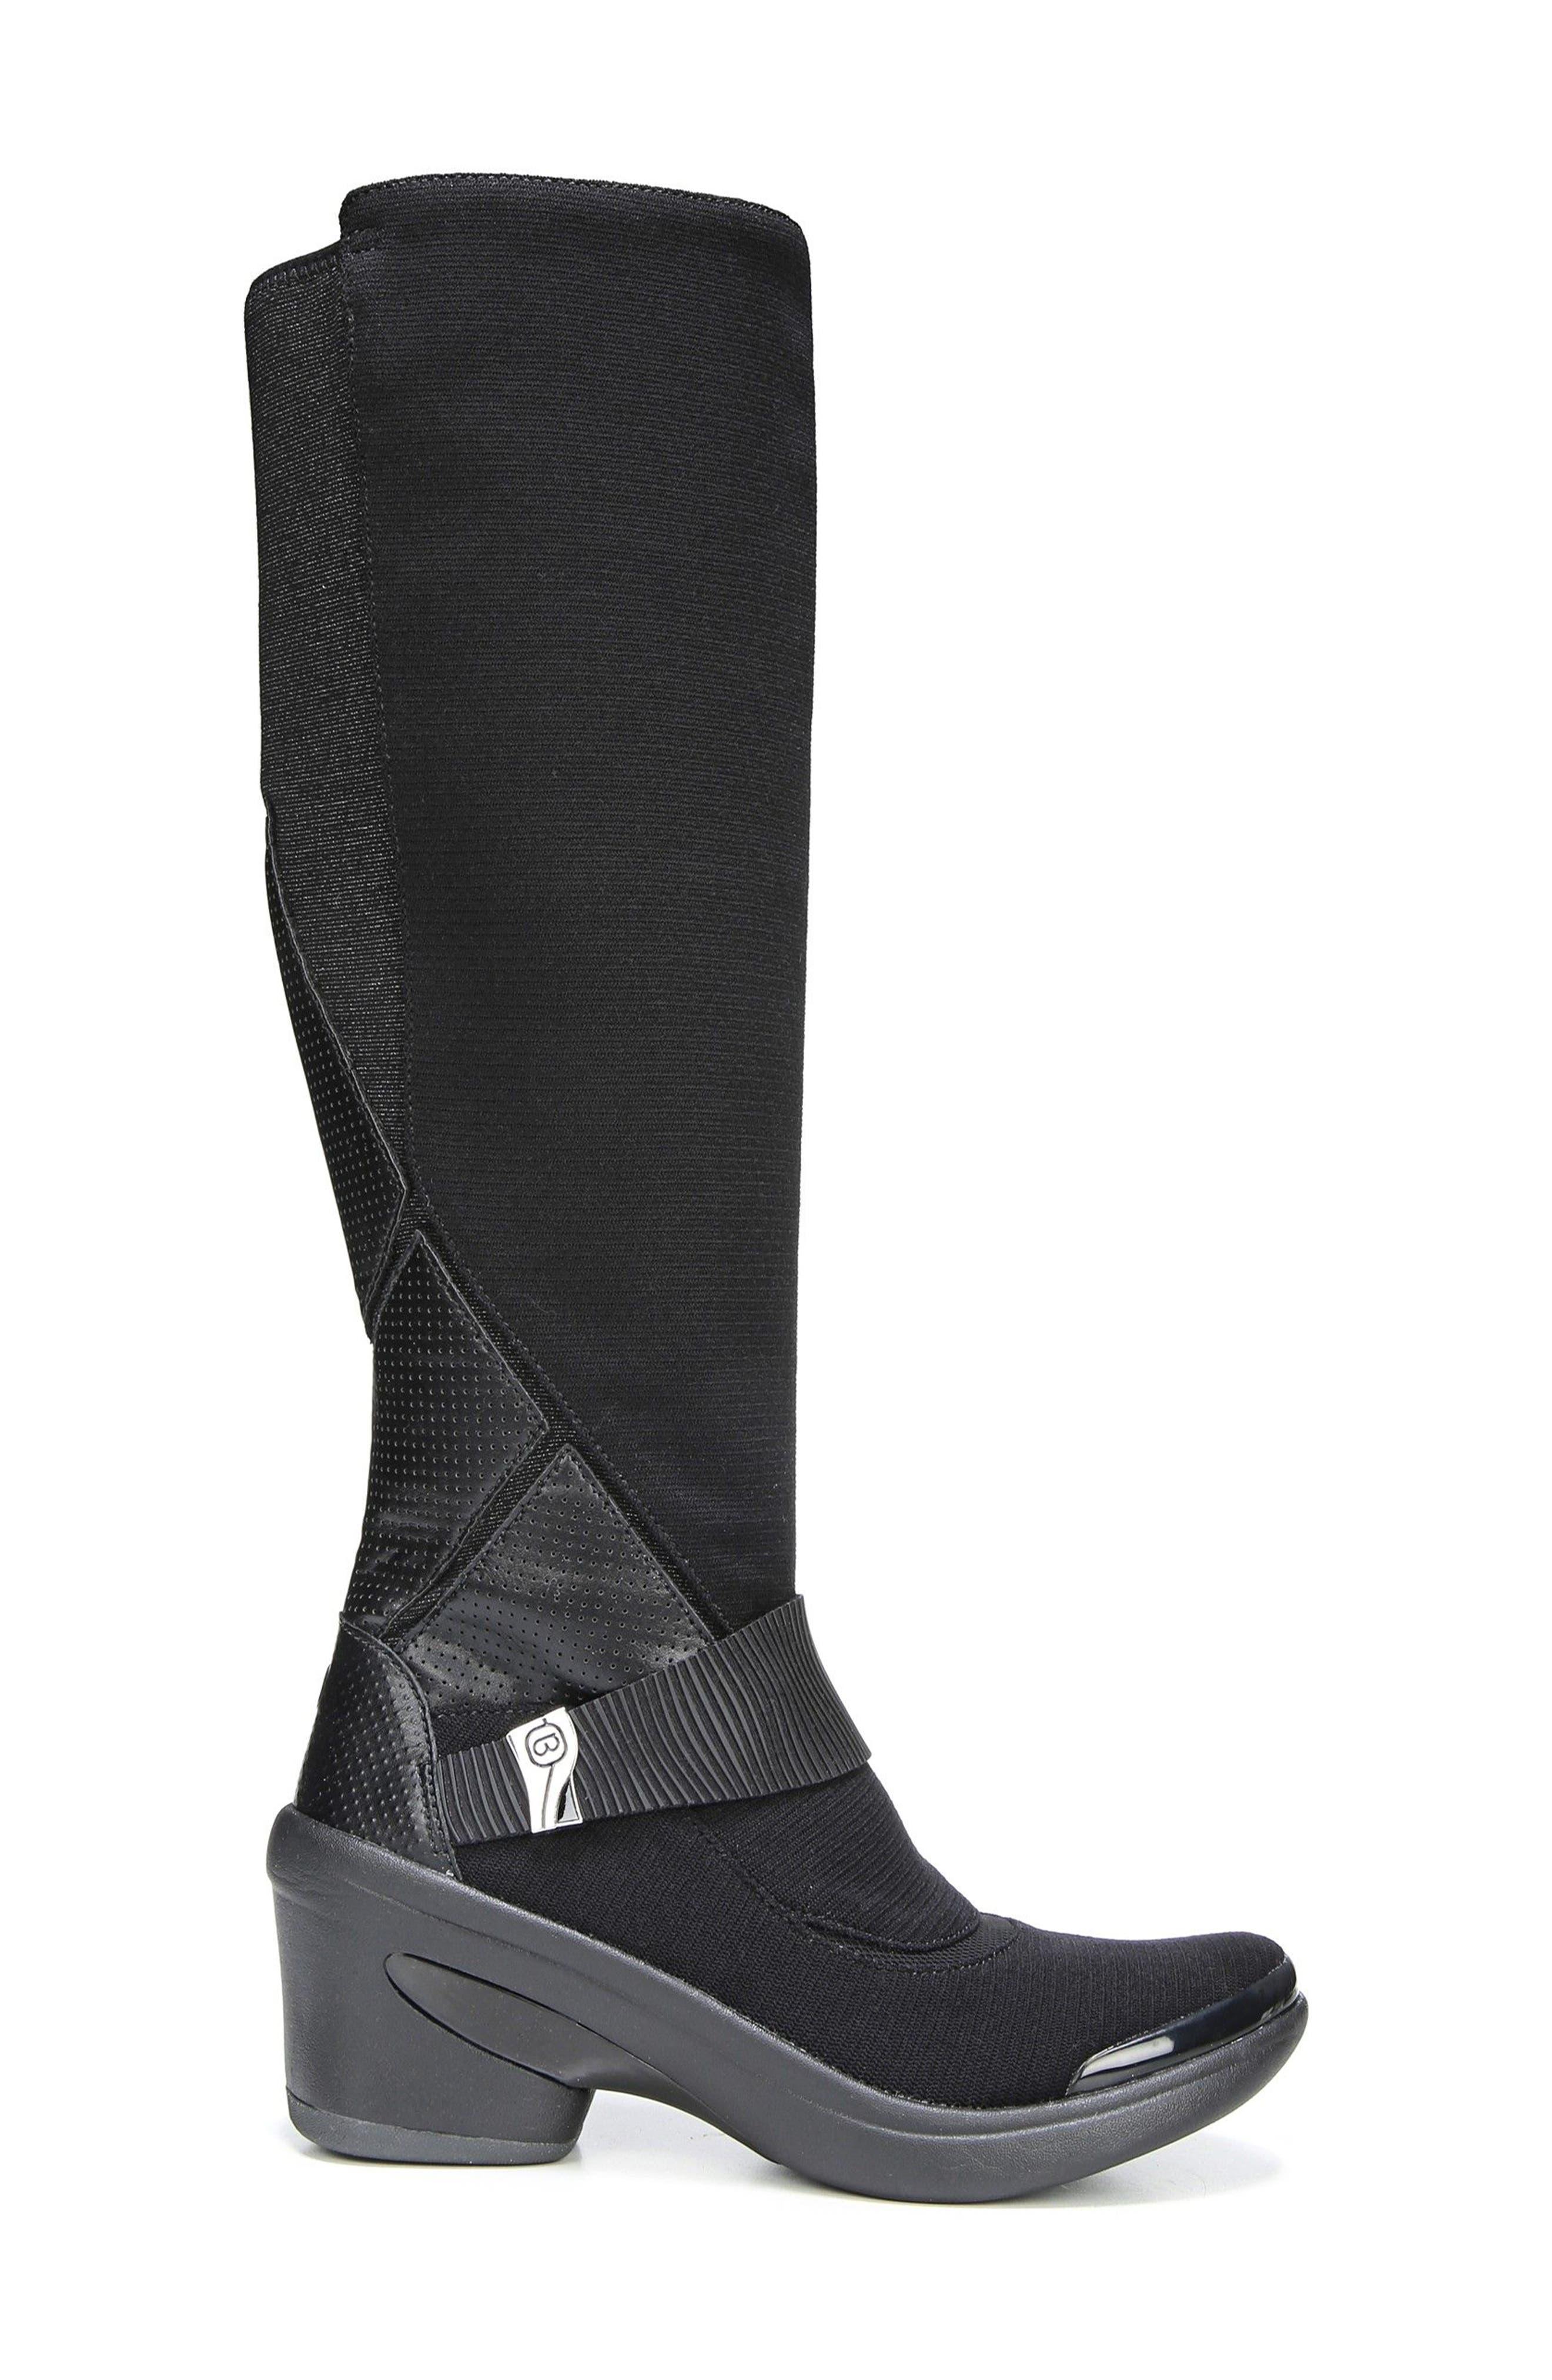 Enchanted Boot,                             Alternate thumbnail 3, color,                             Black Fabric